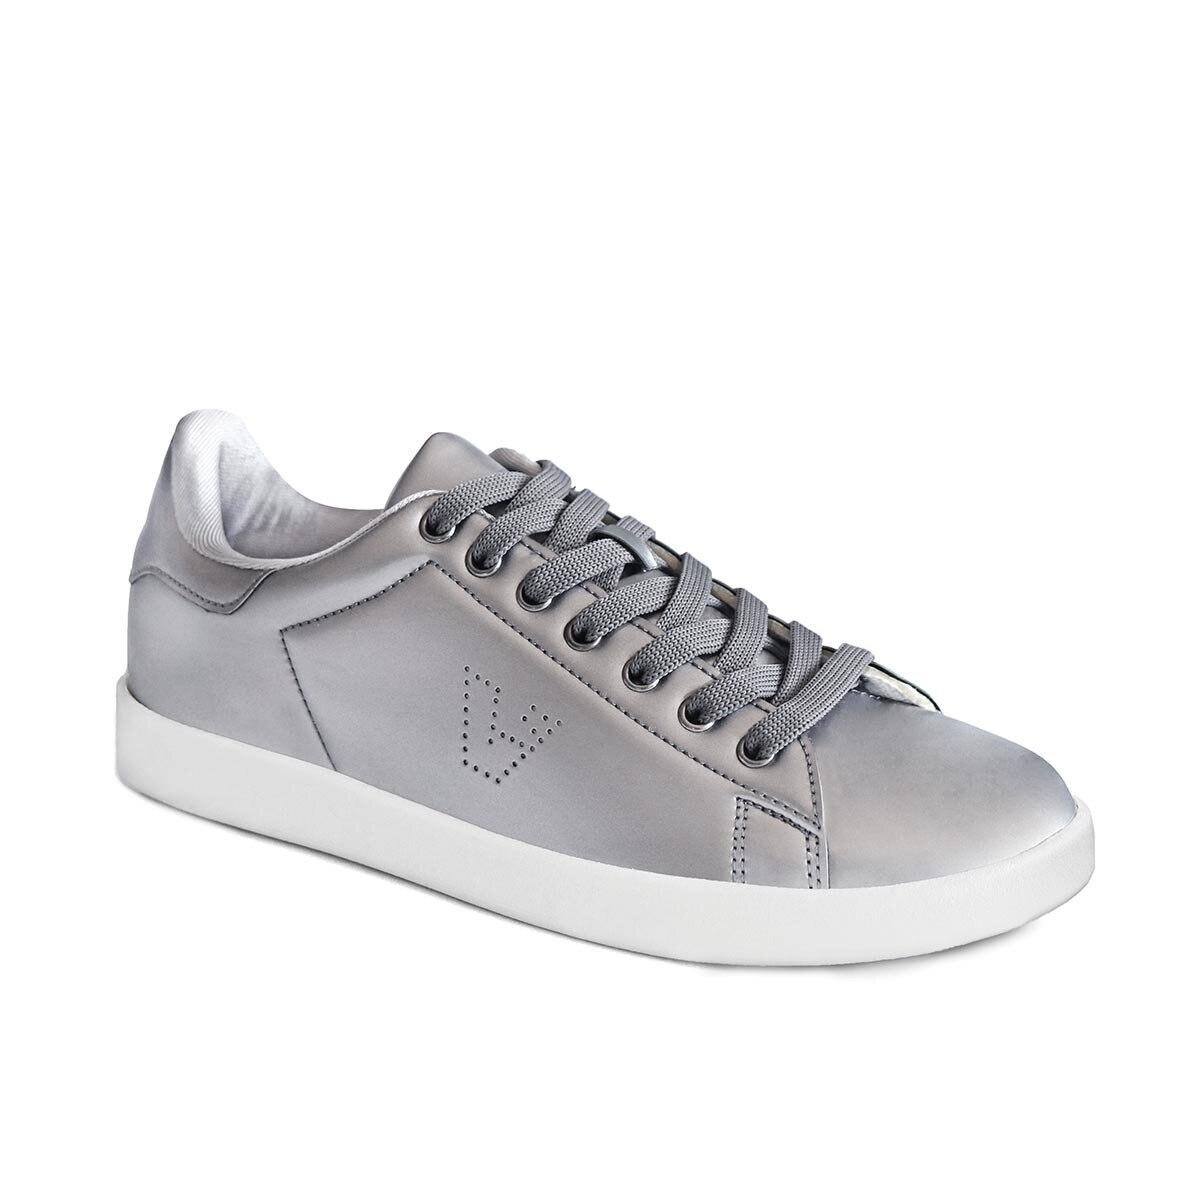 FLO 313. G19K. 201 Silver Female Child Sneaker Shoes VICCO